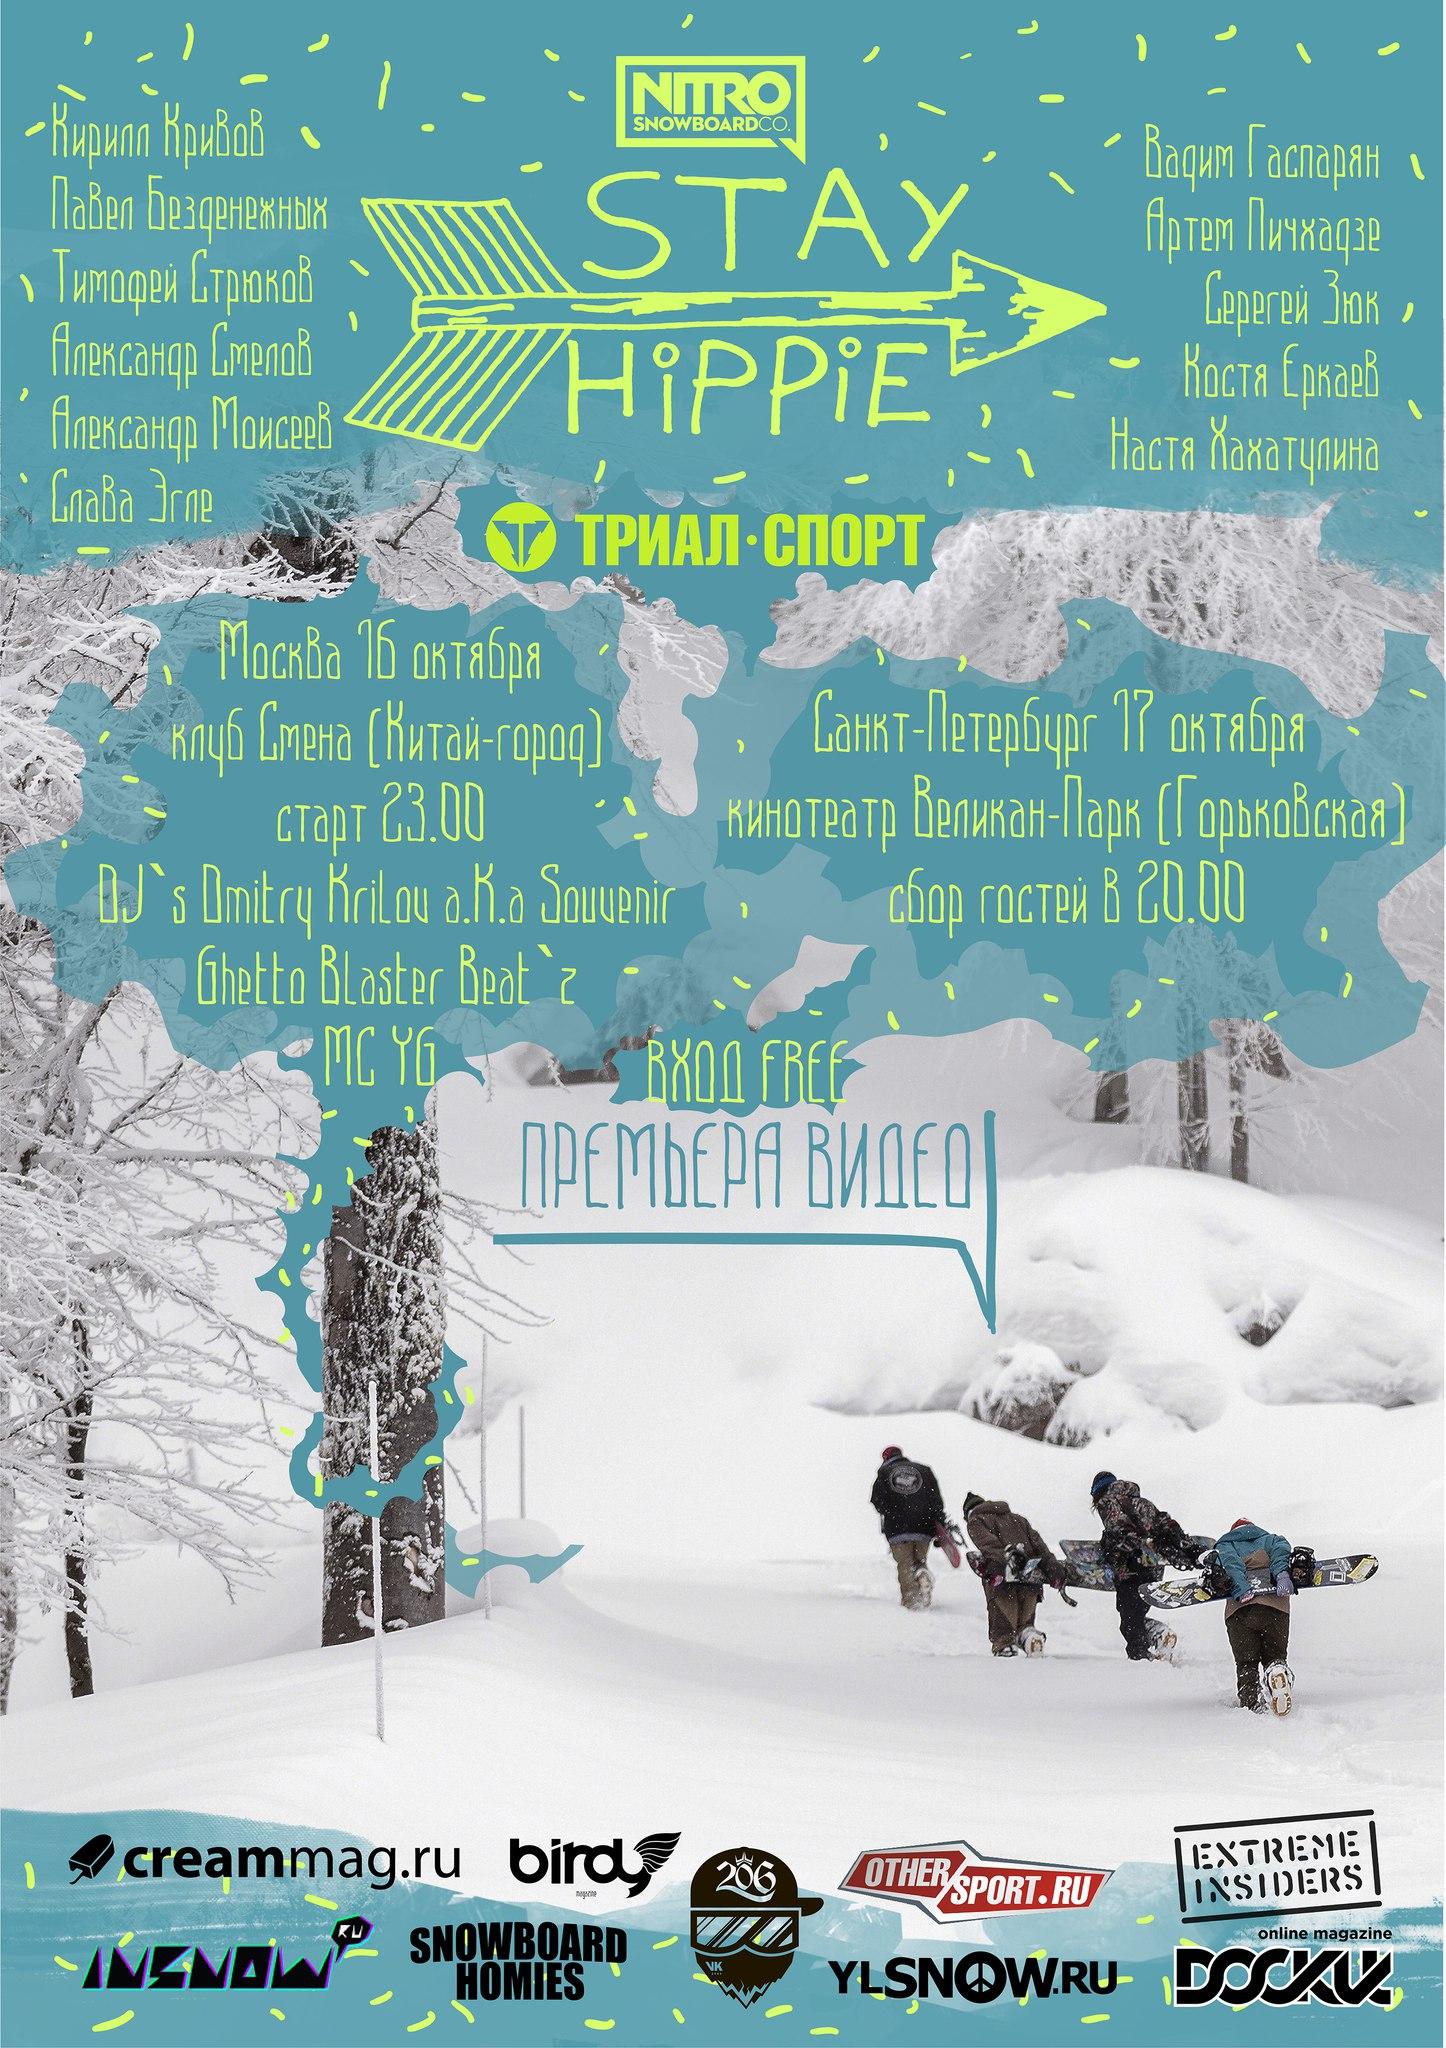 photomolotov, Sochi, Красная Поляна, Роза Хутор, Riders Lodge, Snowboarding, Snowboard, Nitro Snowboard, Nitro Snowboard Russia, Stay Hippie